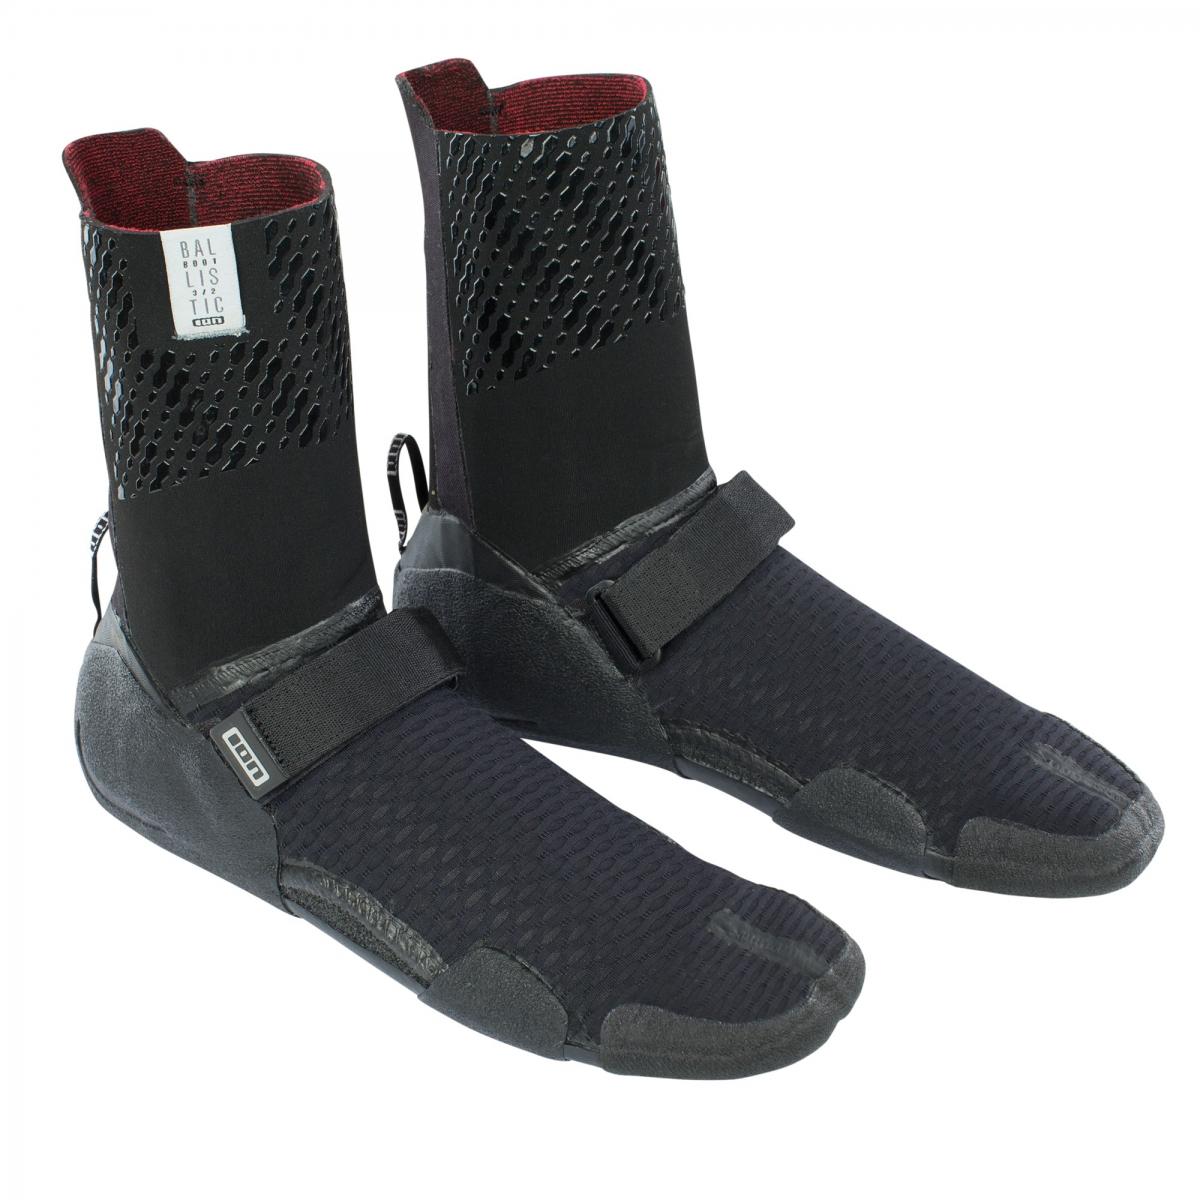 Buty neoprenowe ION neo Balistic Boots 3/2 mm